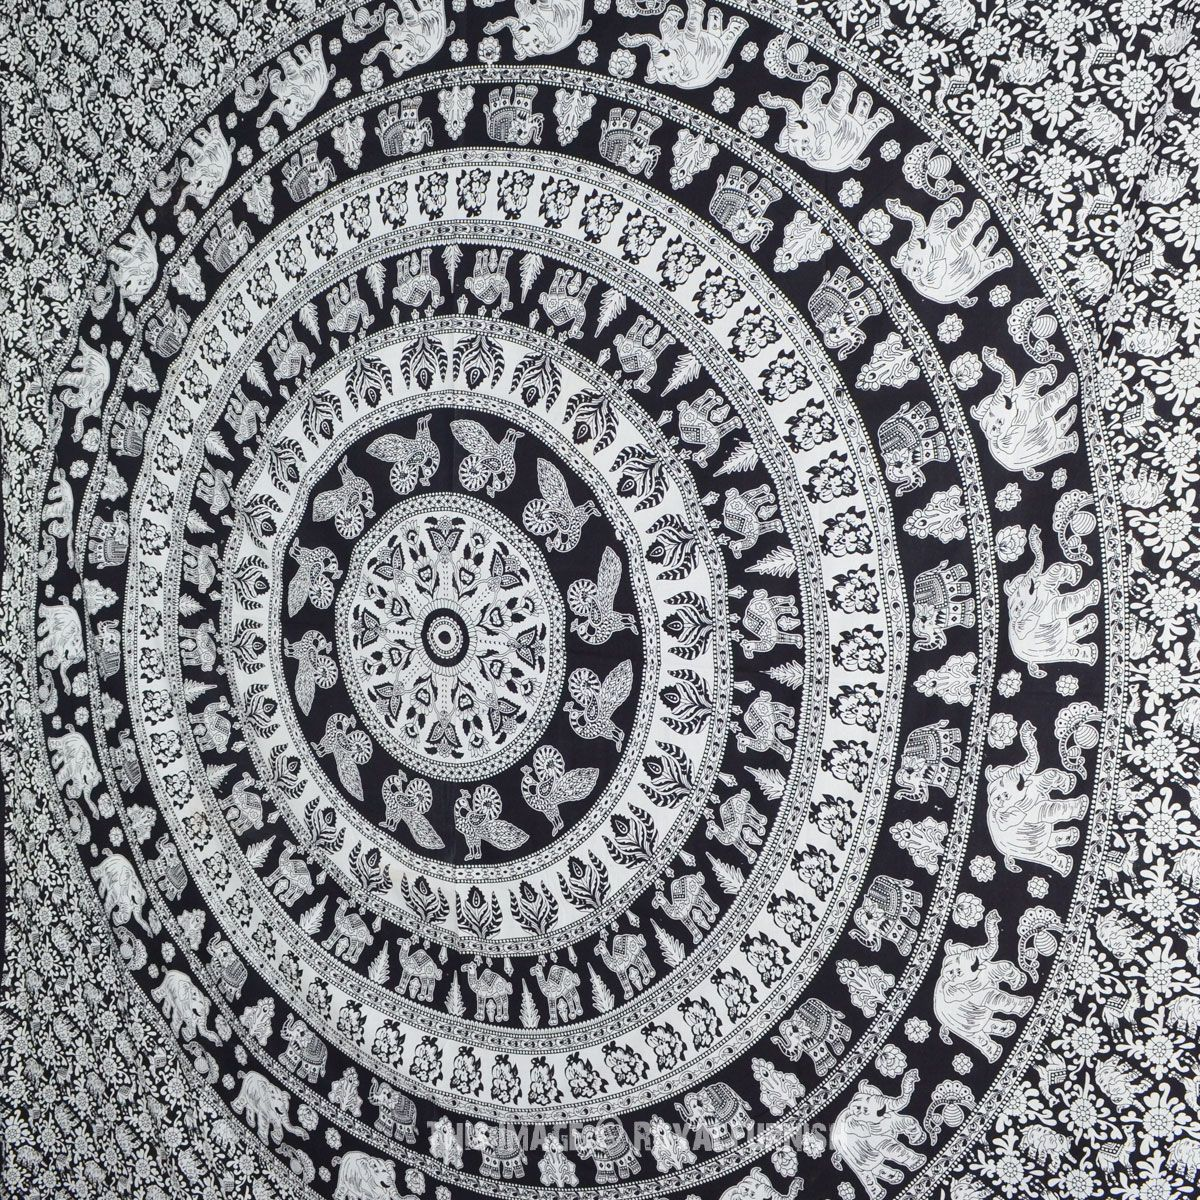 Blue multi elephants sun ombre mandala wall tapestry royalfurnish - Black And White Indian Elephant Mandala Tapestry Wall Hanging Hippie Bedspread On Royalfurnish Com